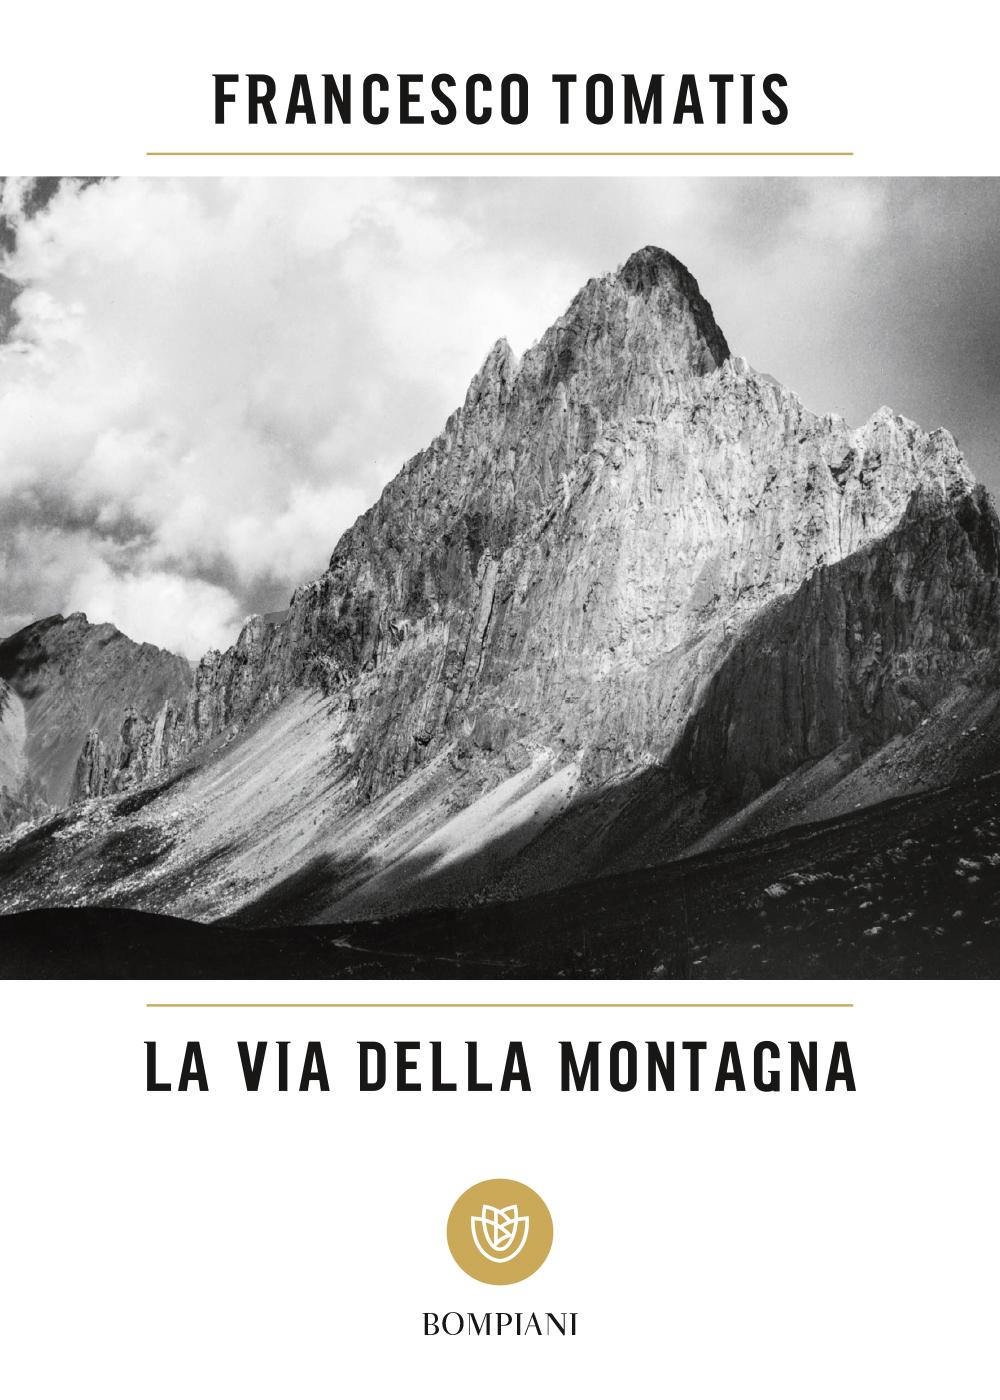 La via della montagna